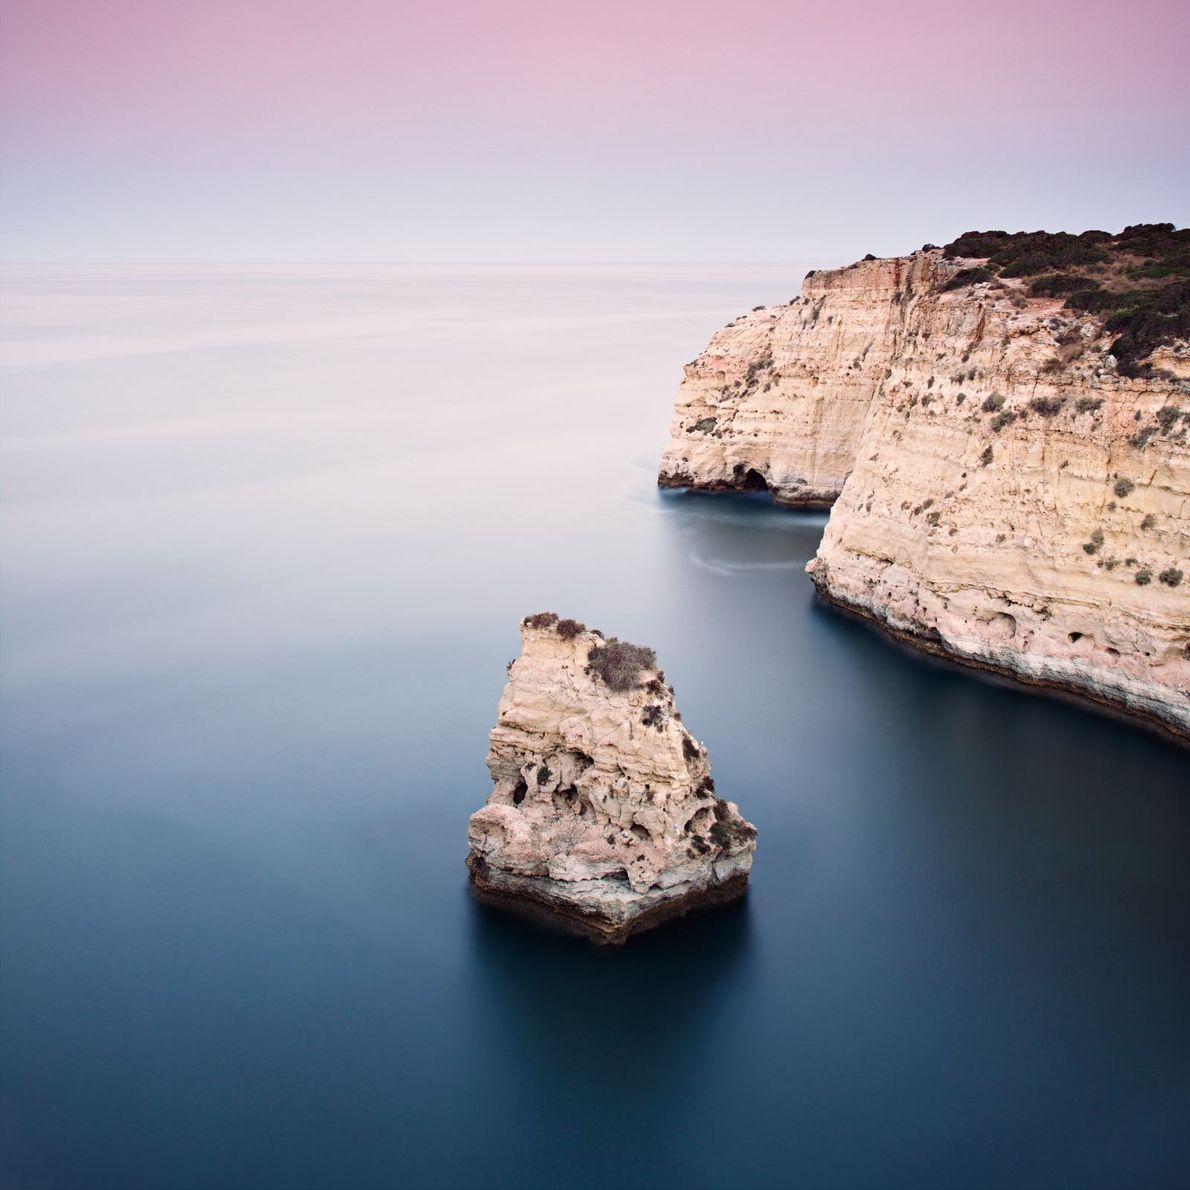 Picture of Portugal's Algarve coast